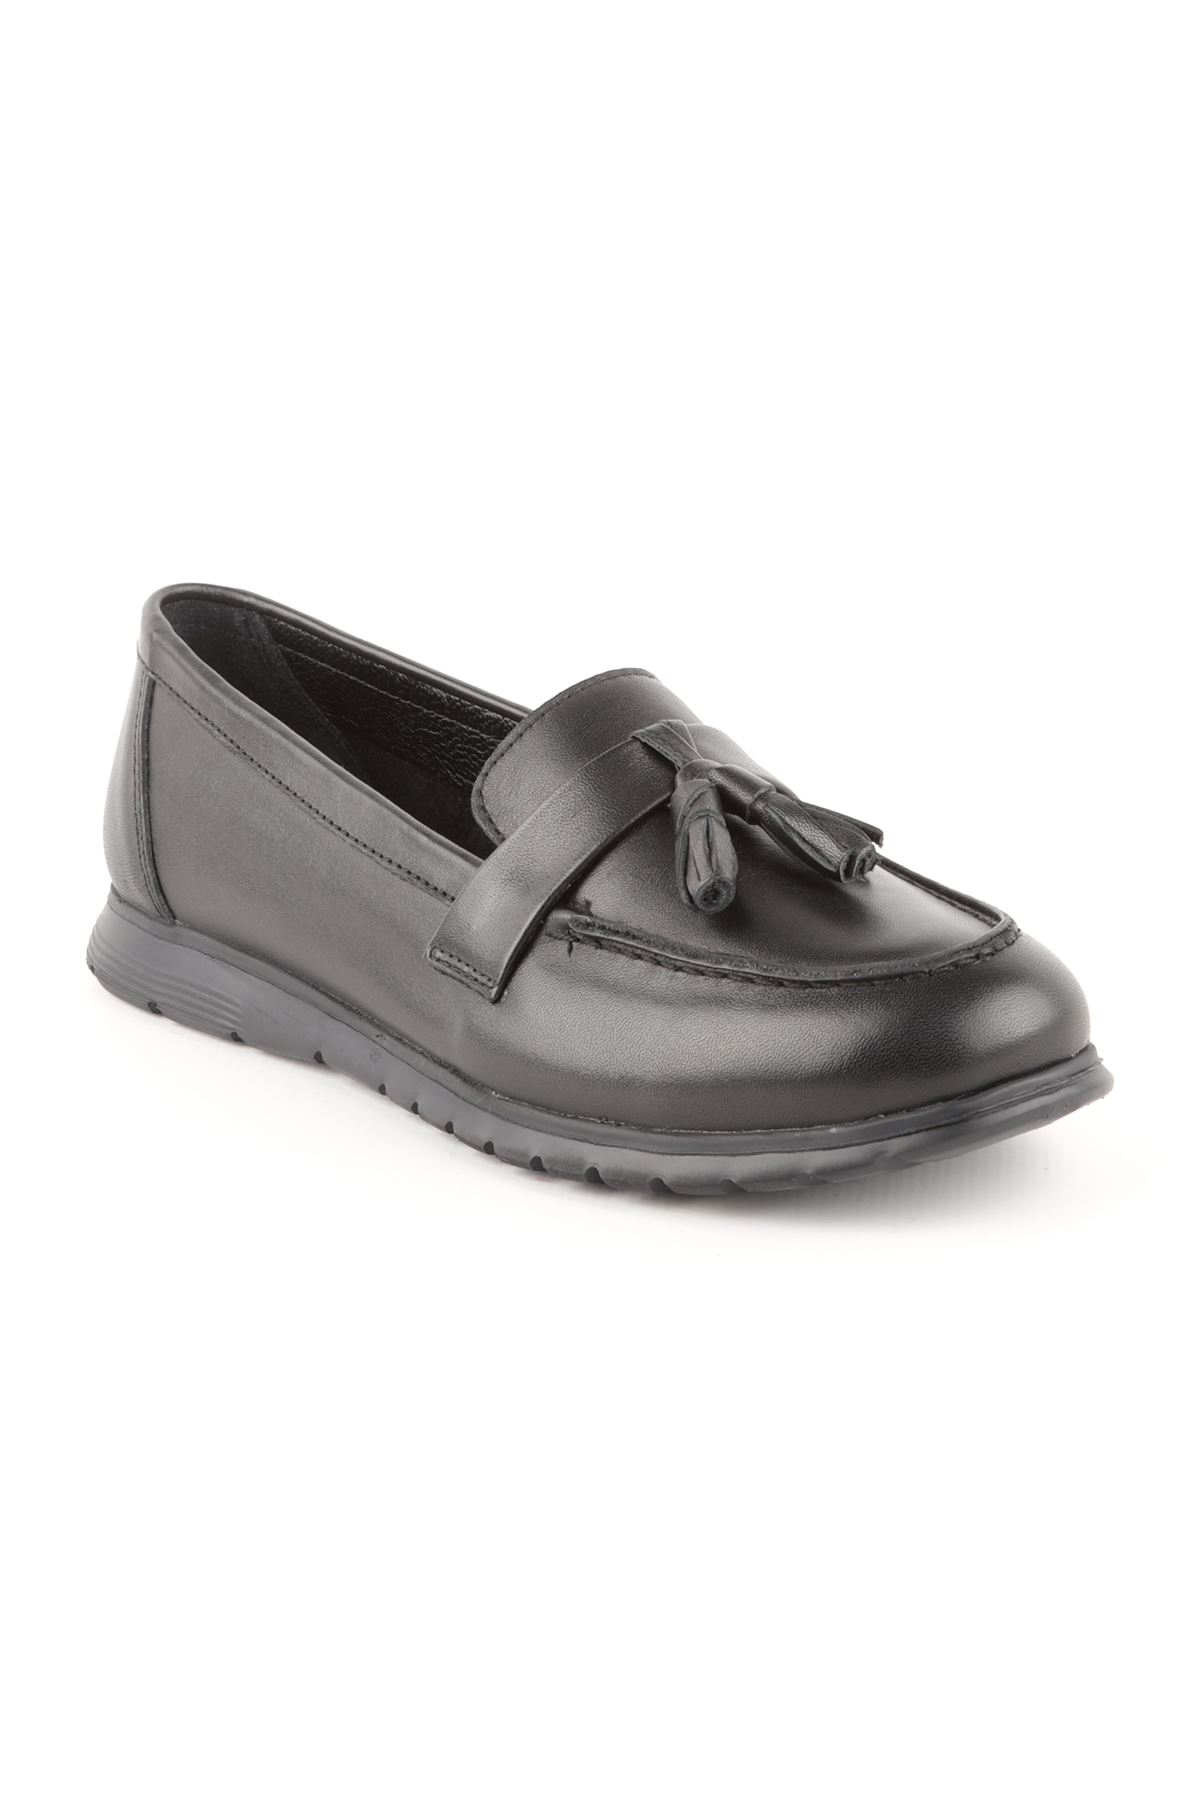 Libero L04.402 Siyah Loafer Ayakkabı